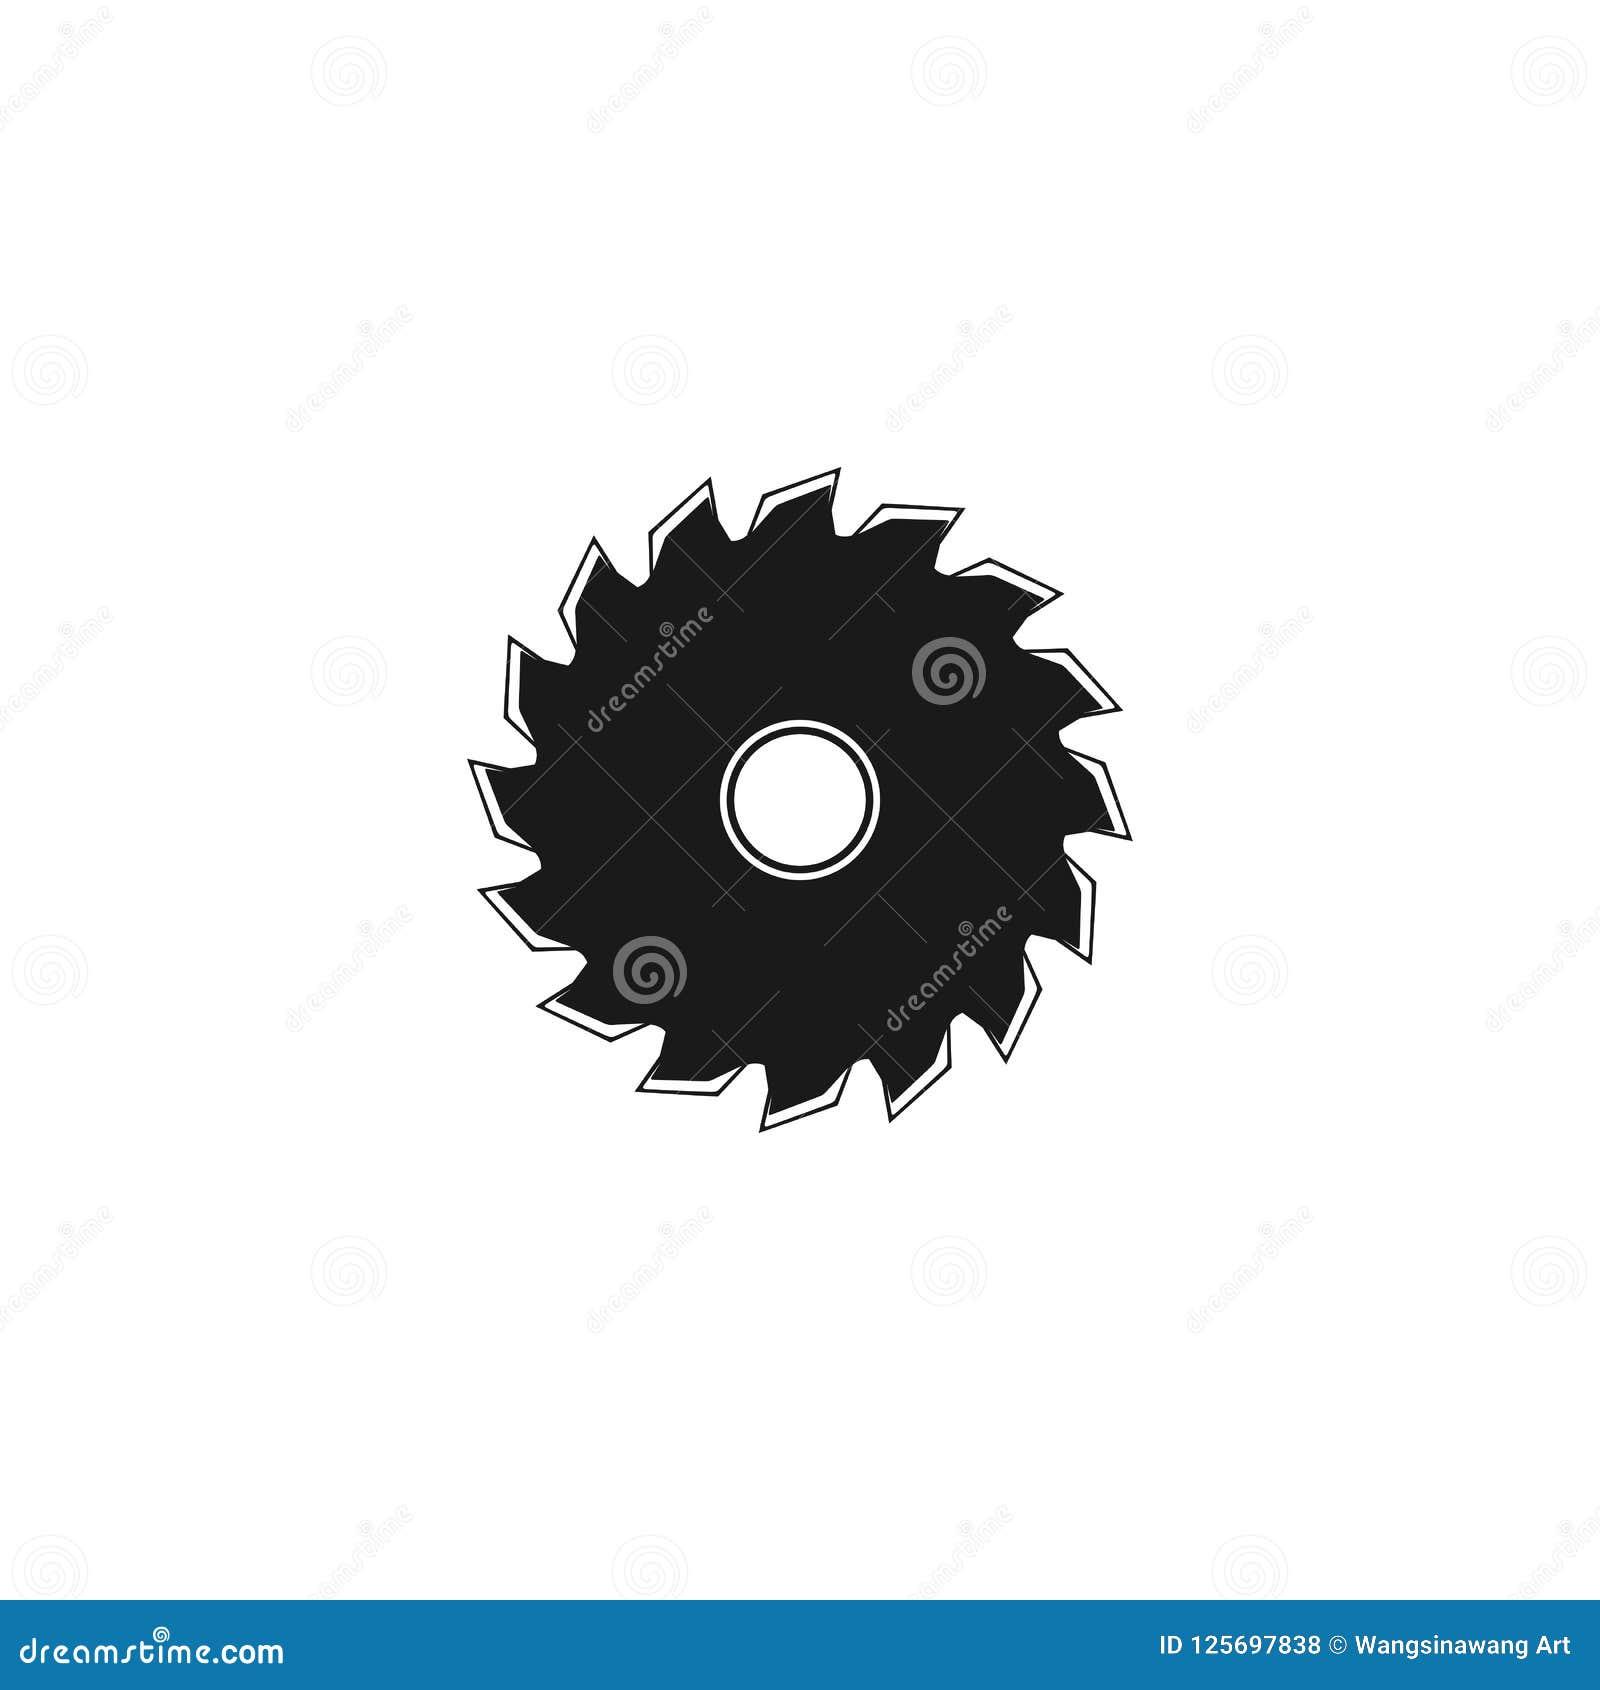 Wood Cutter Timber Logo Design Inspiration Stock Vector Illustration Of Woodwork Construction 125697838